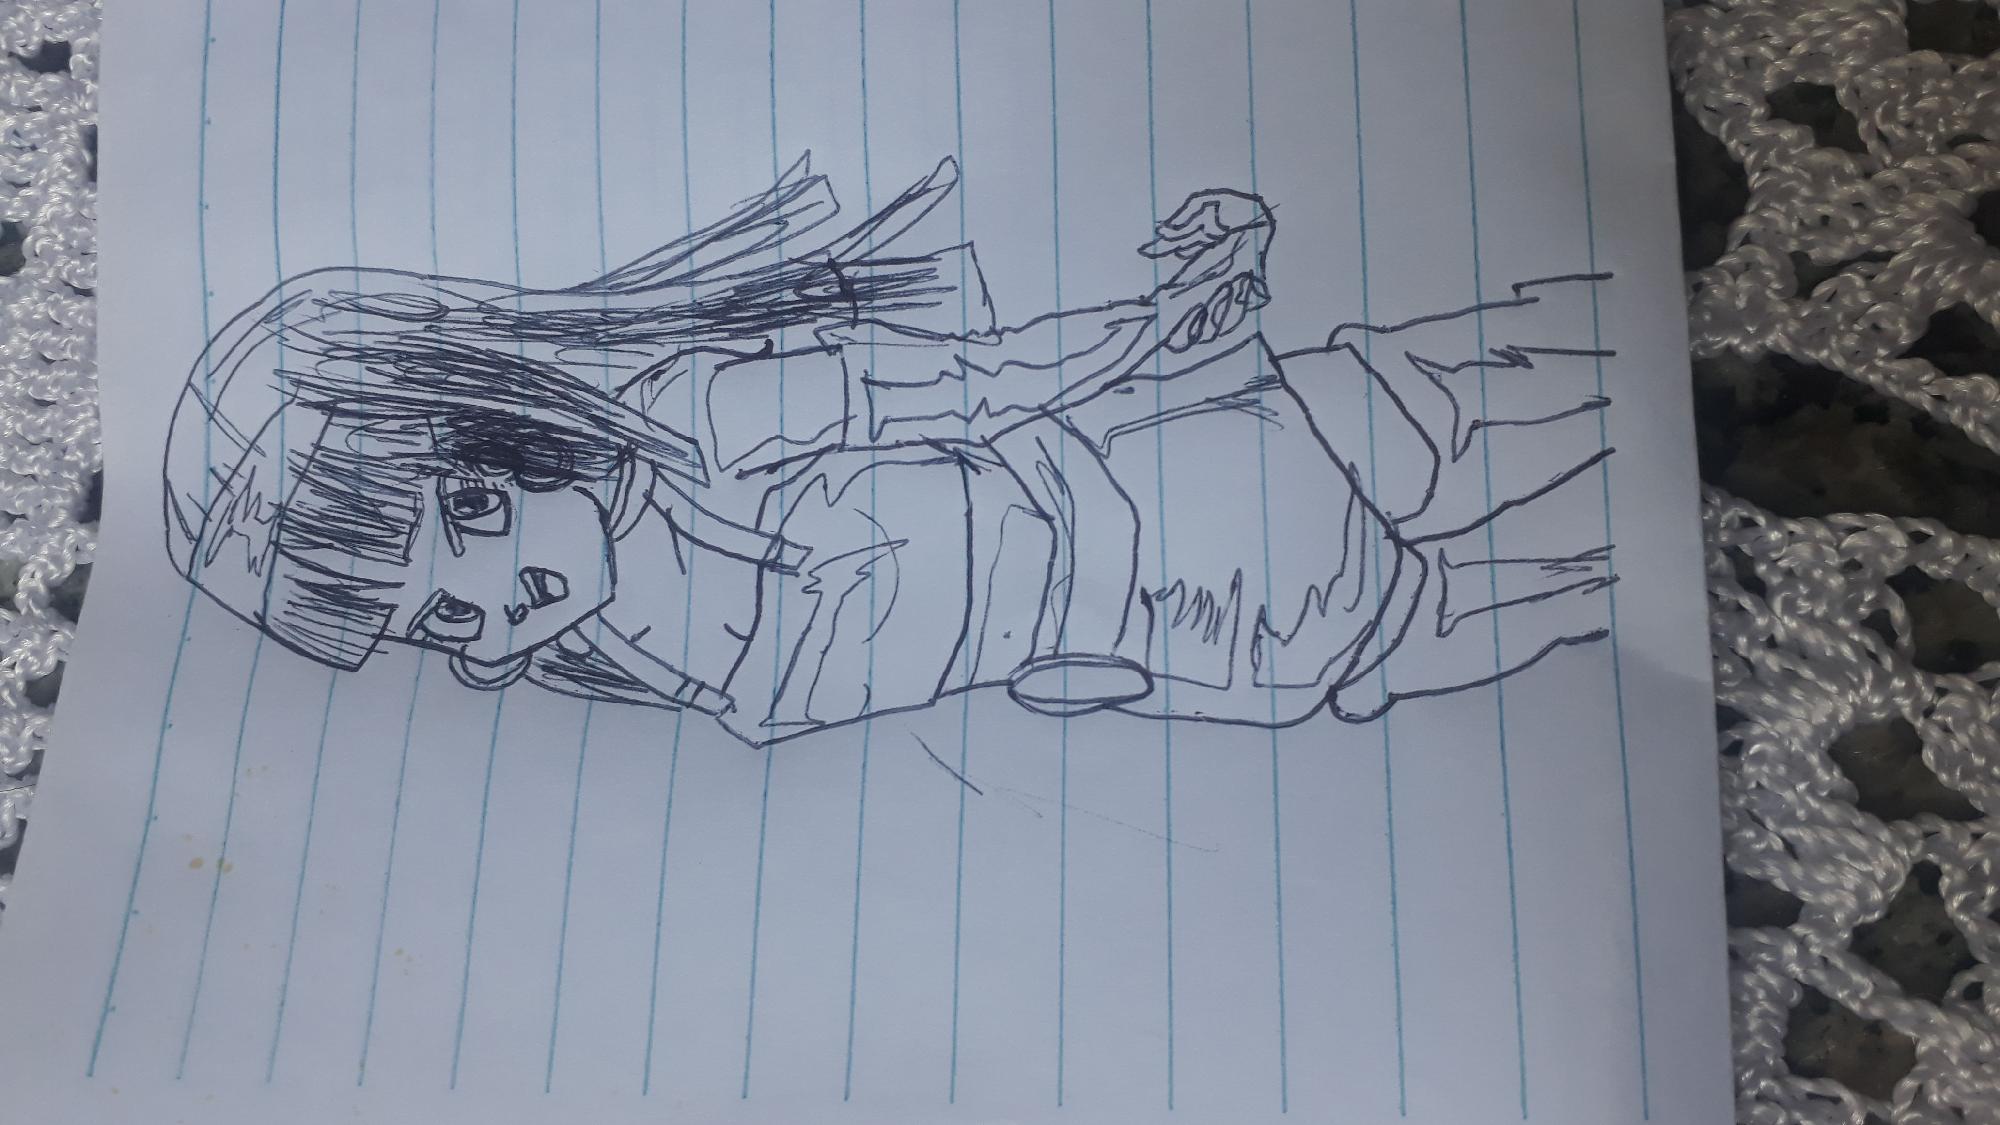 Desenhei a Bra kkkk